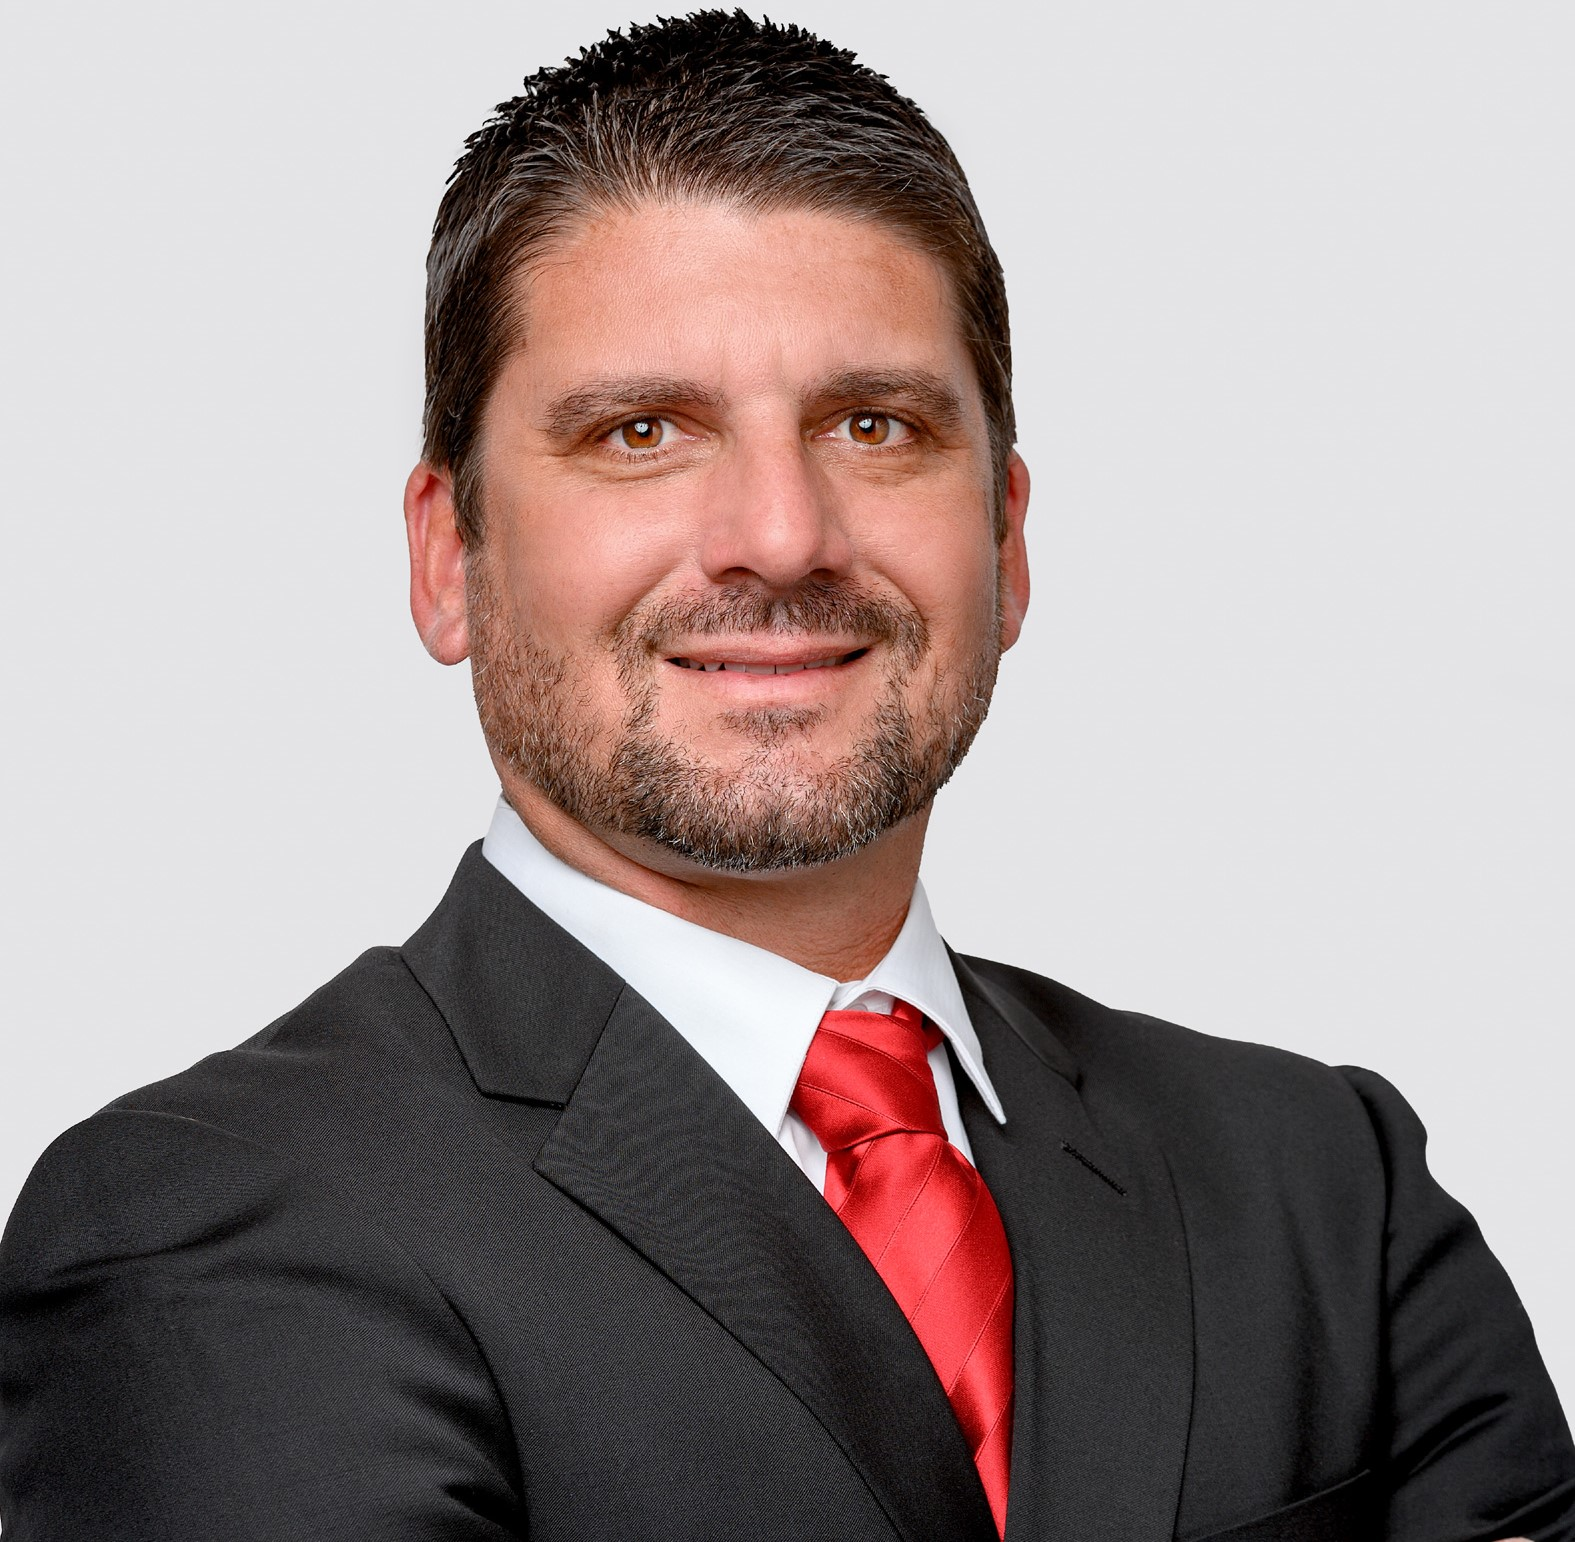 Todd J. Blosser